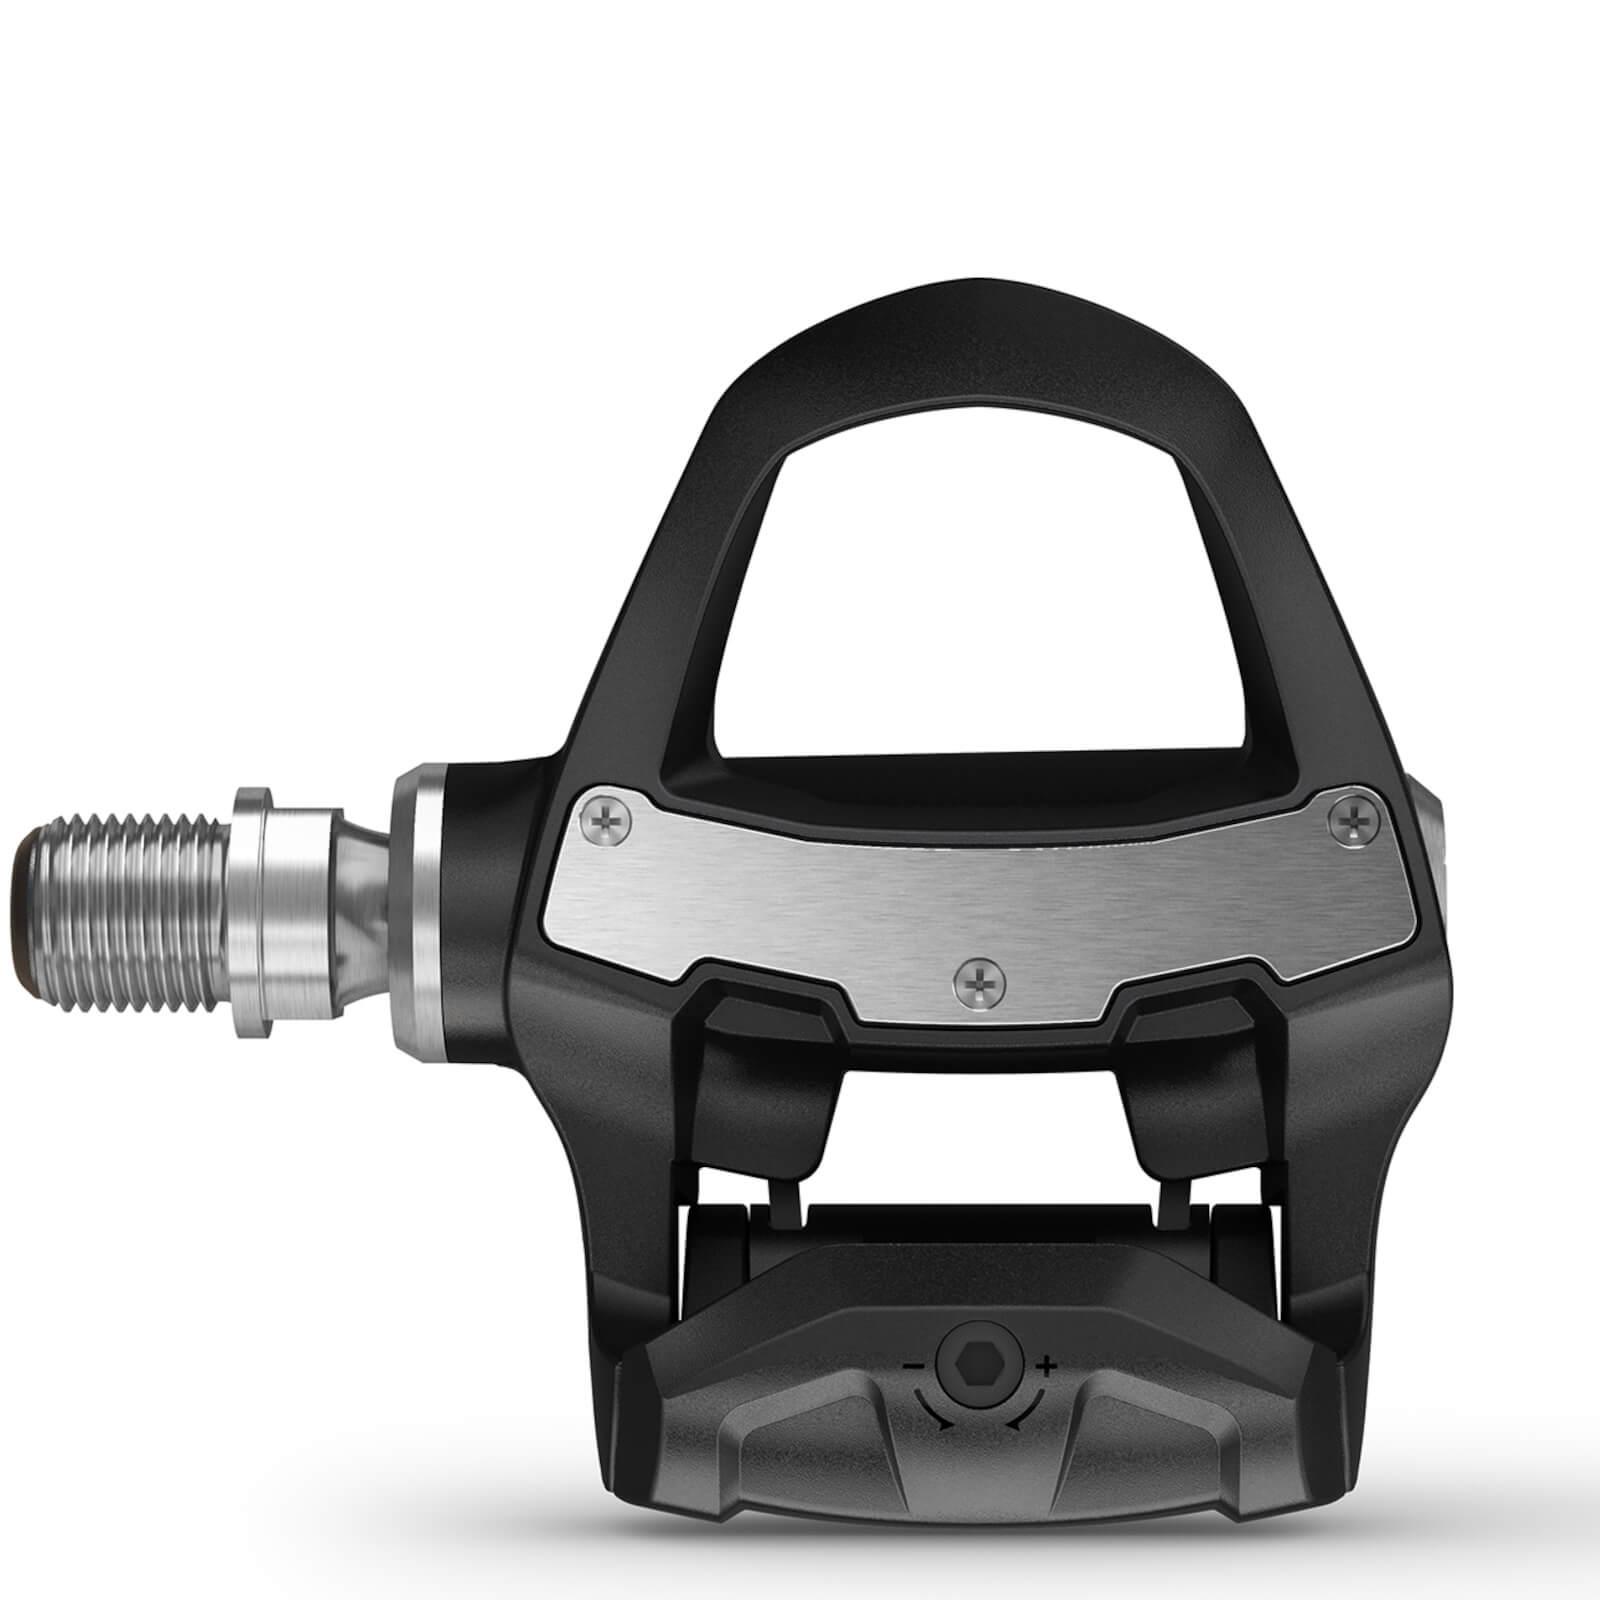 Garmin Rally RK100 Upgrade Pedal